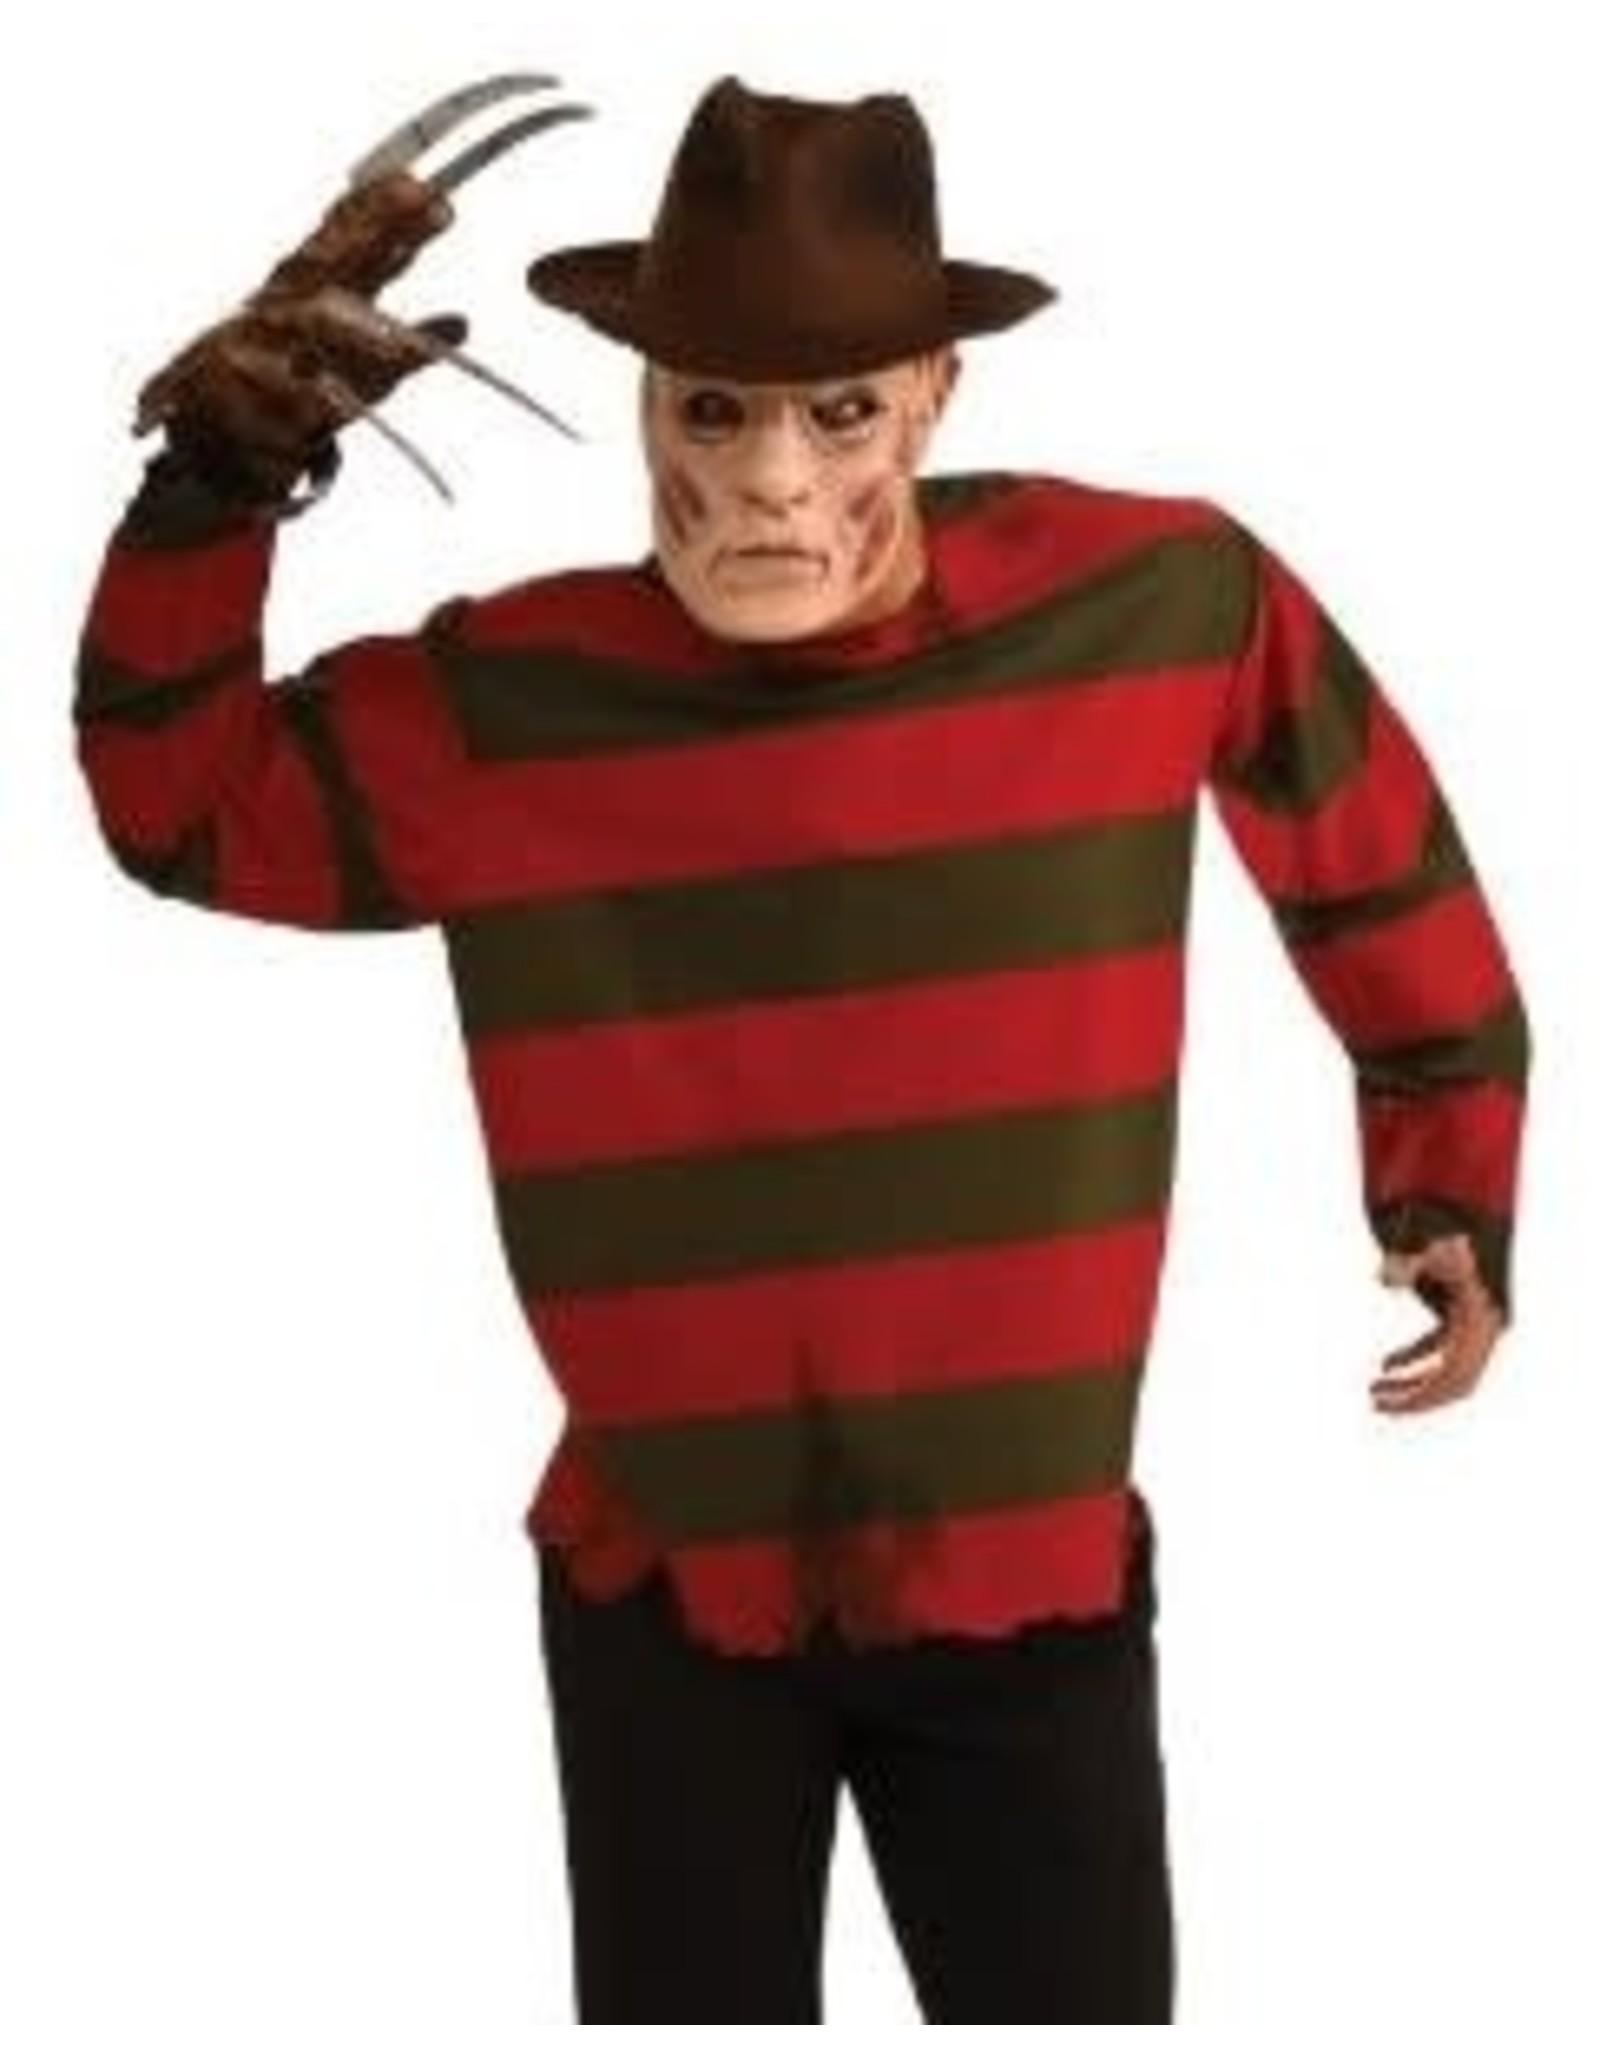 Rubies Costume Freddy Krueger Mask and Shirt